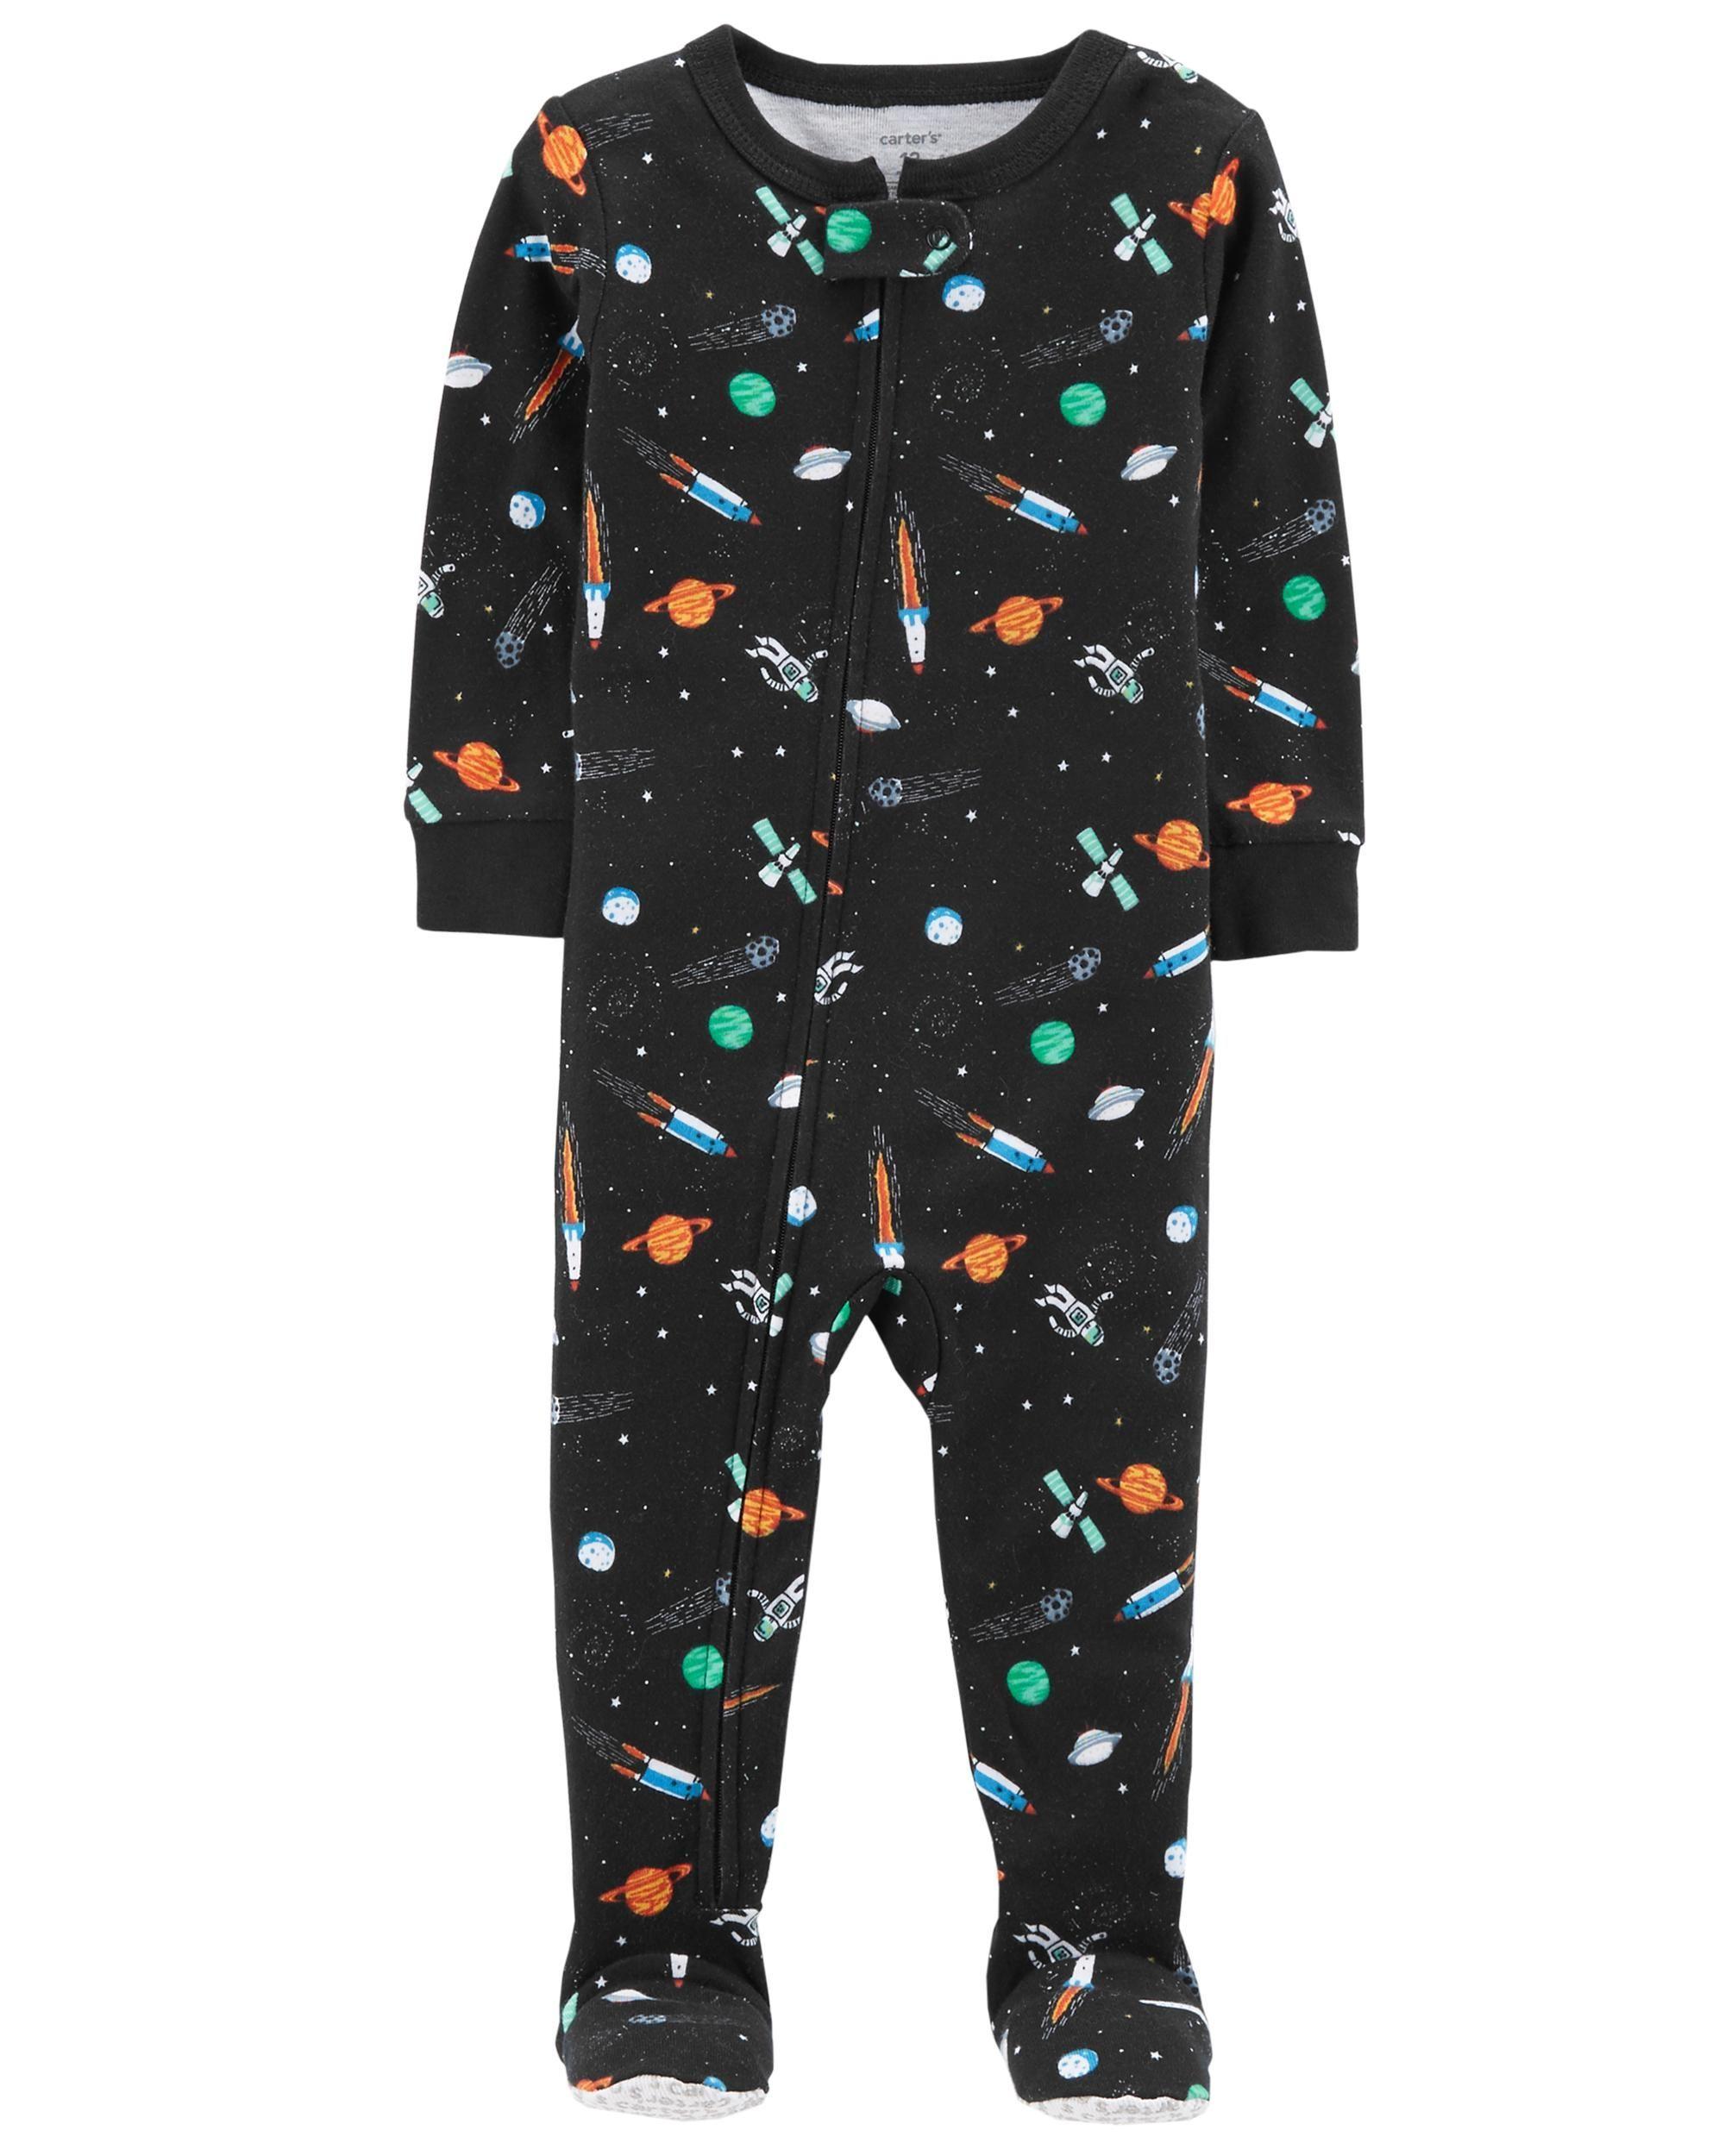 52591916bf7b 1-Piece Space Snug Fit Cotton PJs